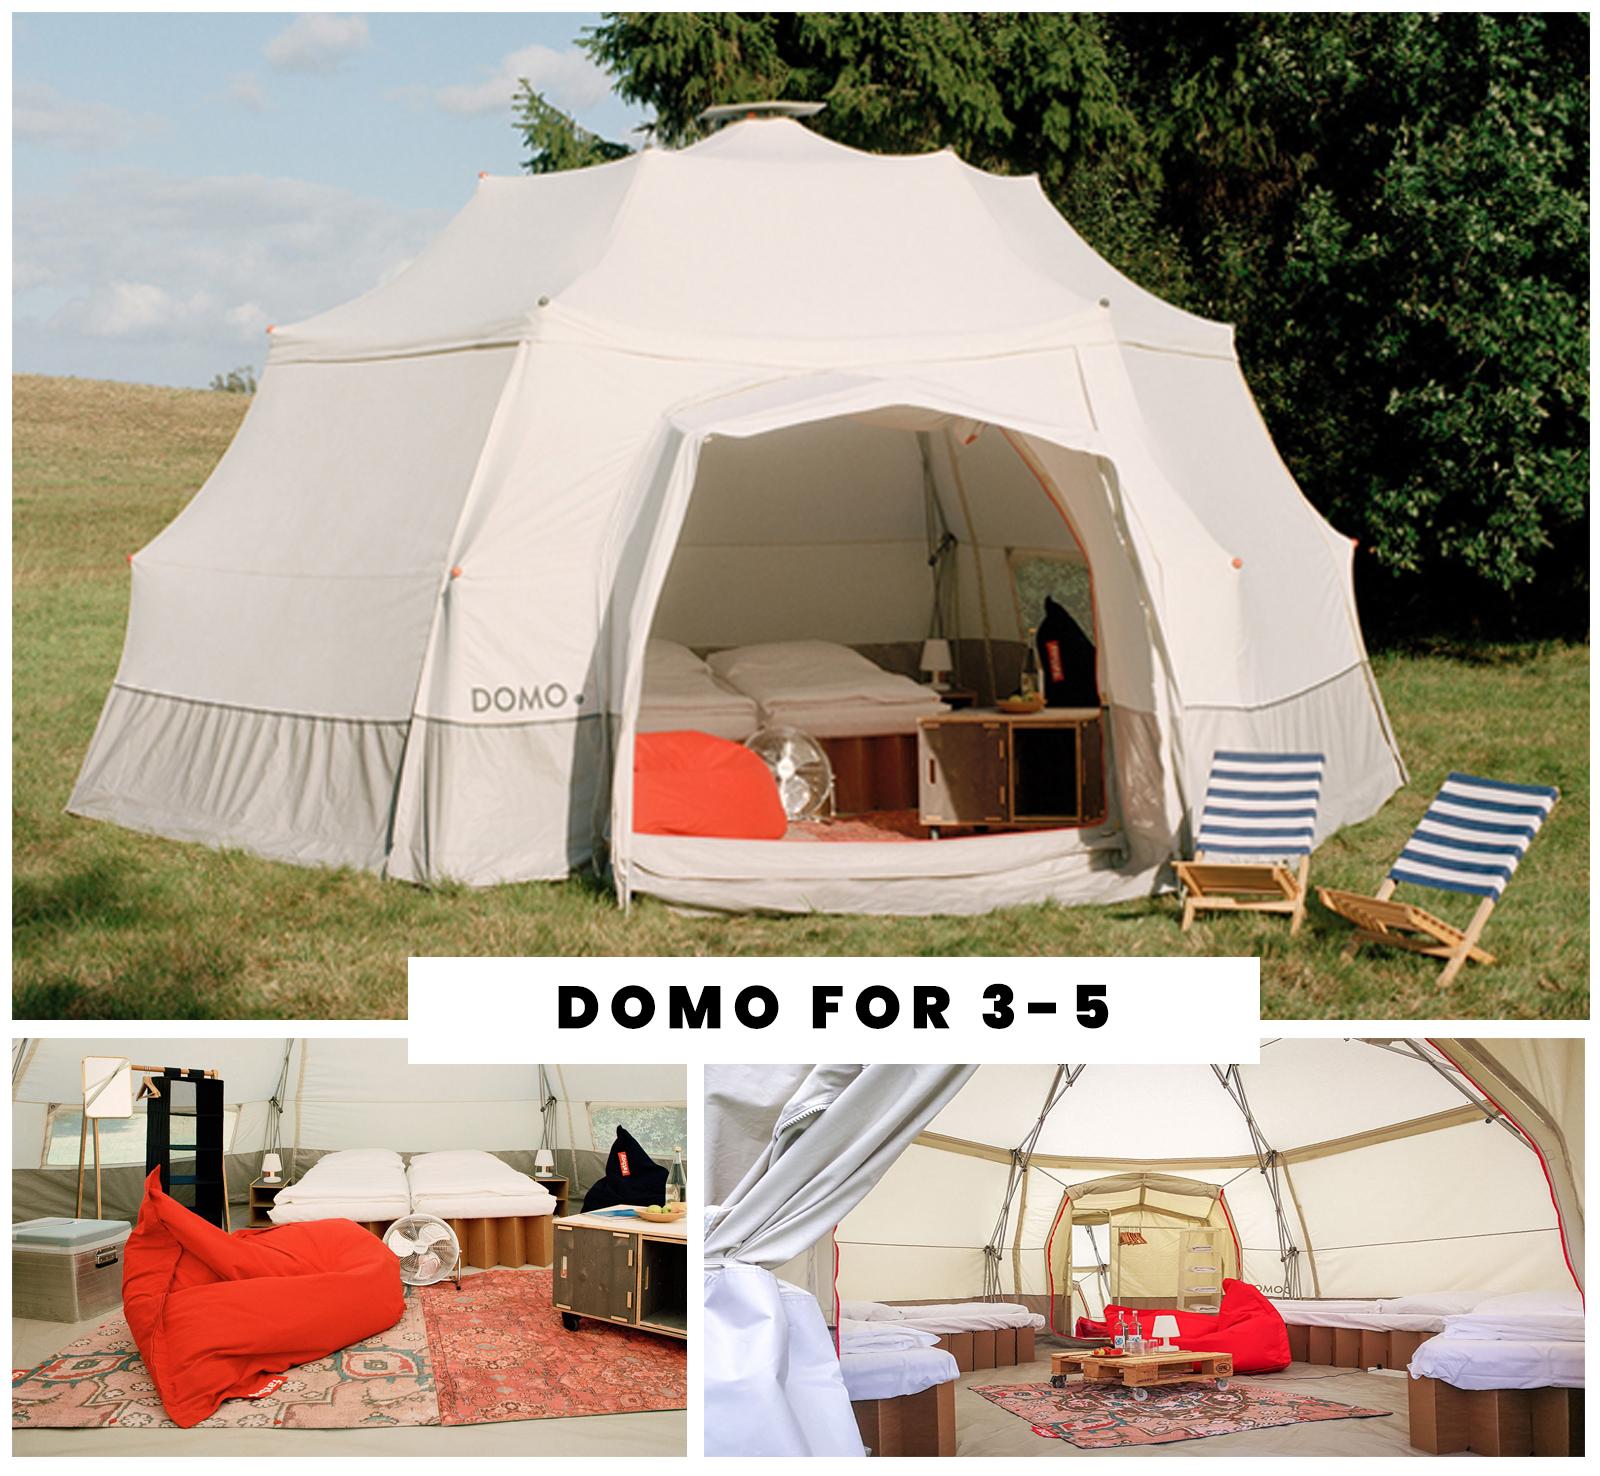 airbnb-titelbild-domo-3-5P